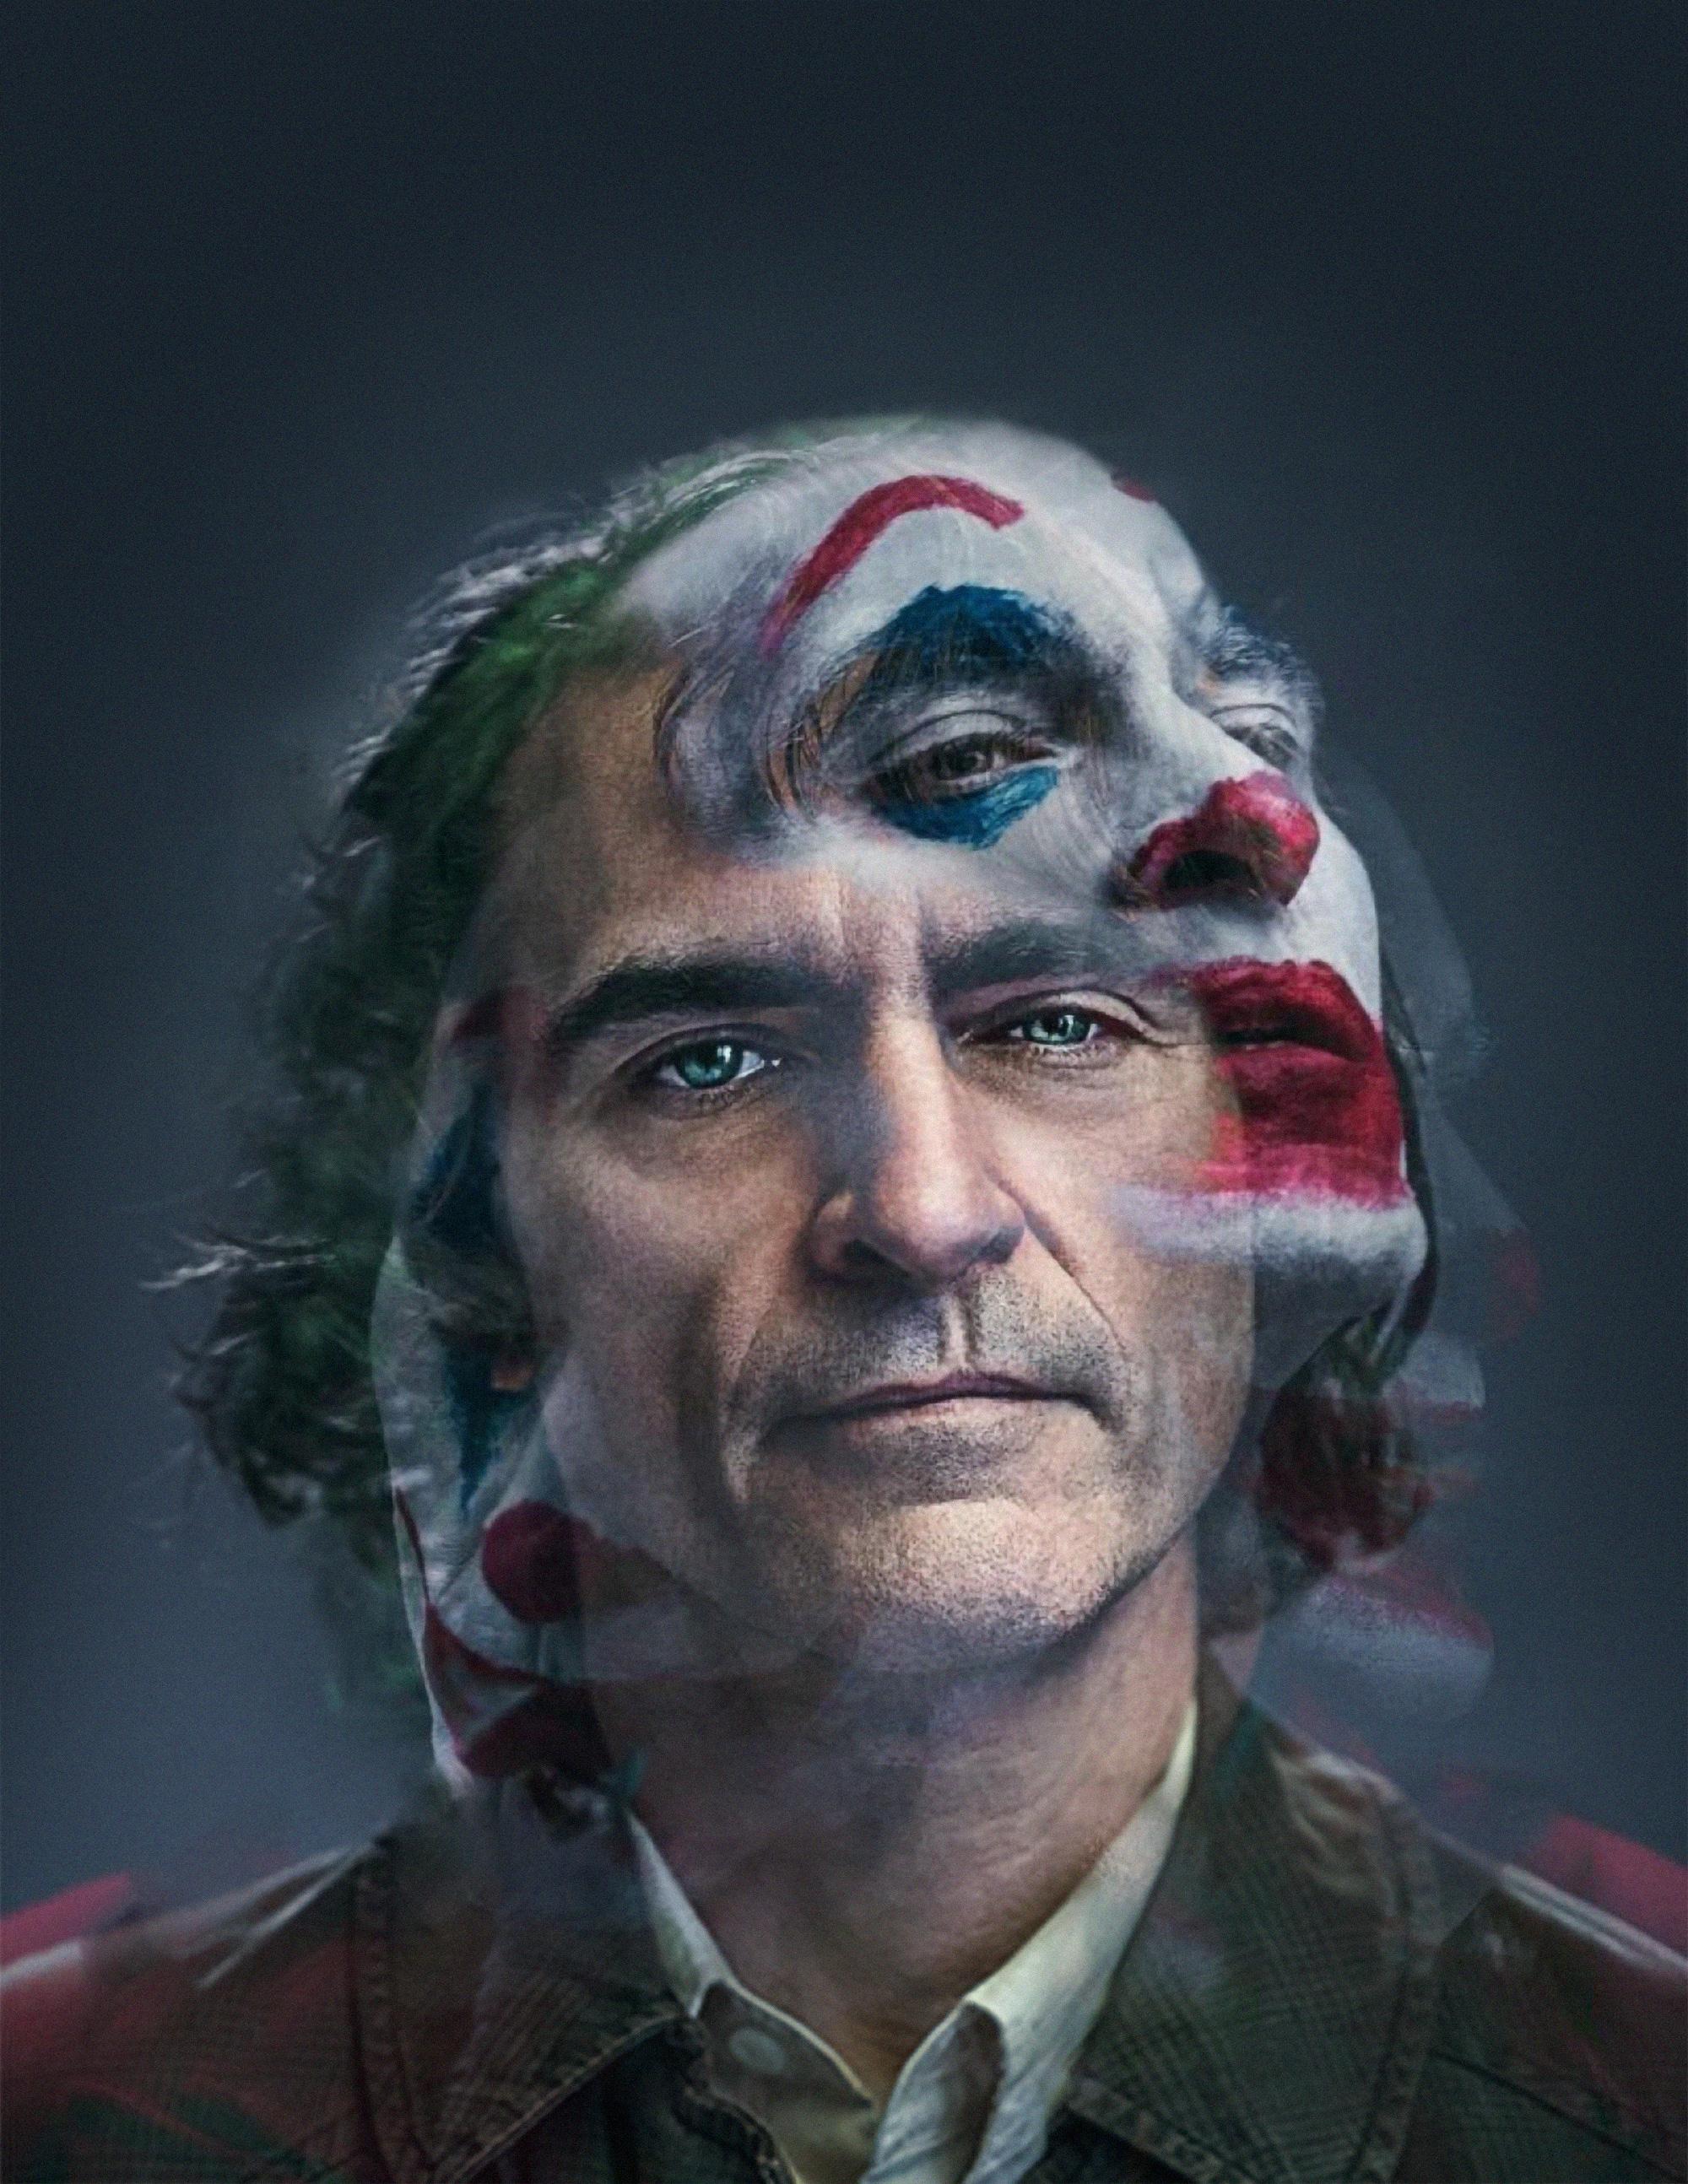 Joker Movie Poster Wallpaper Hd Movies 4k Wallpapers